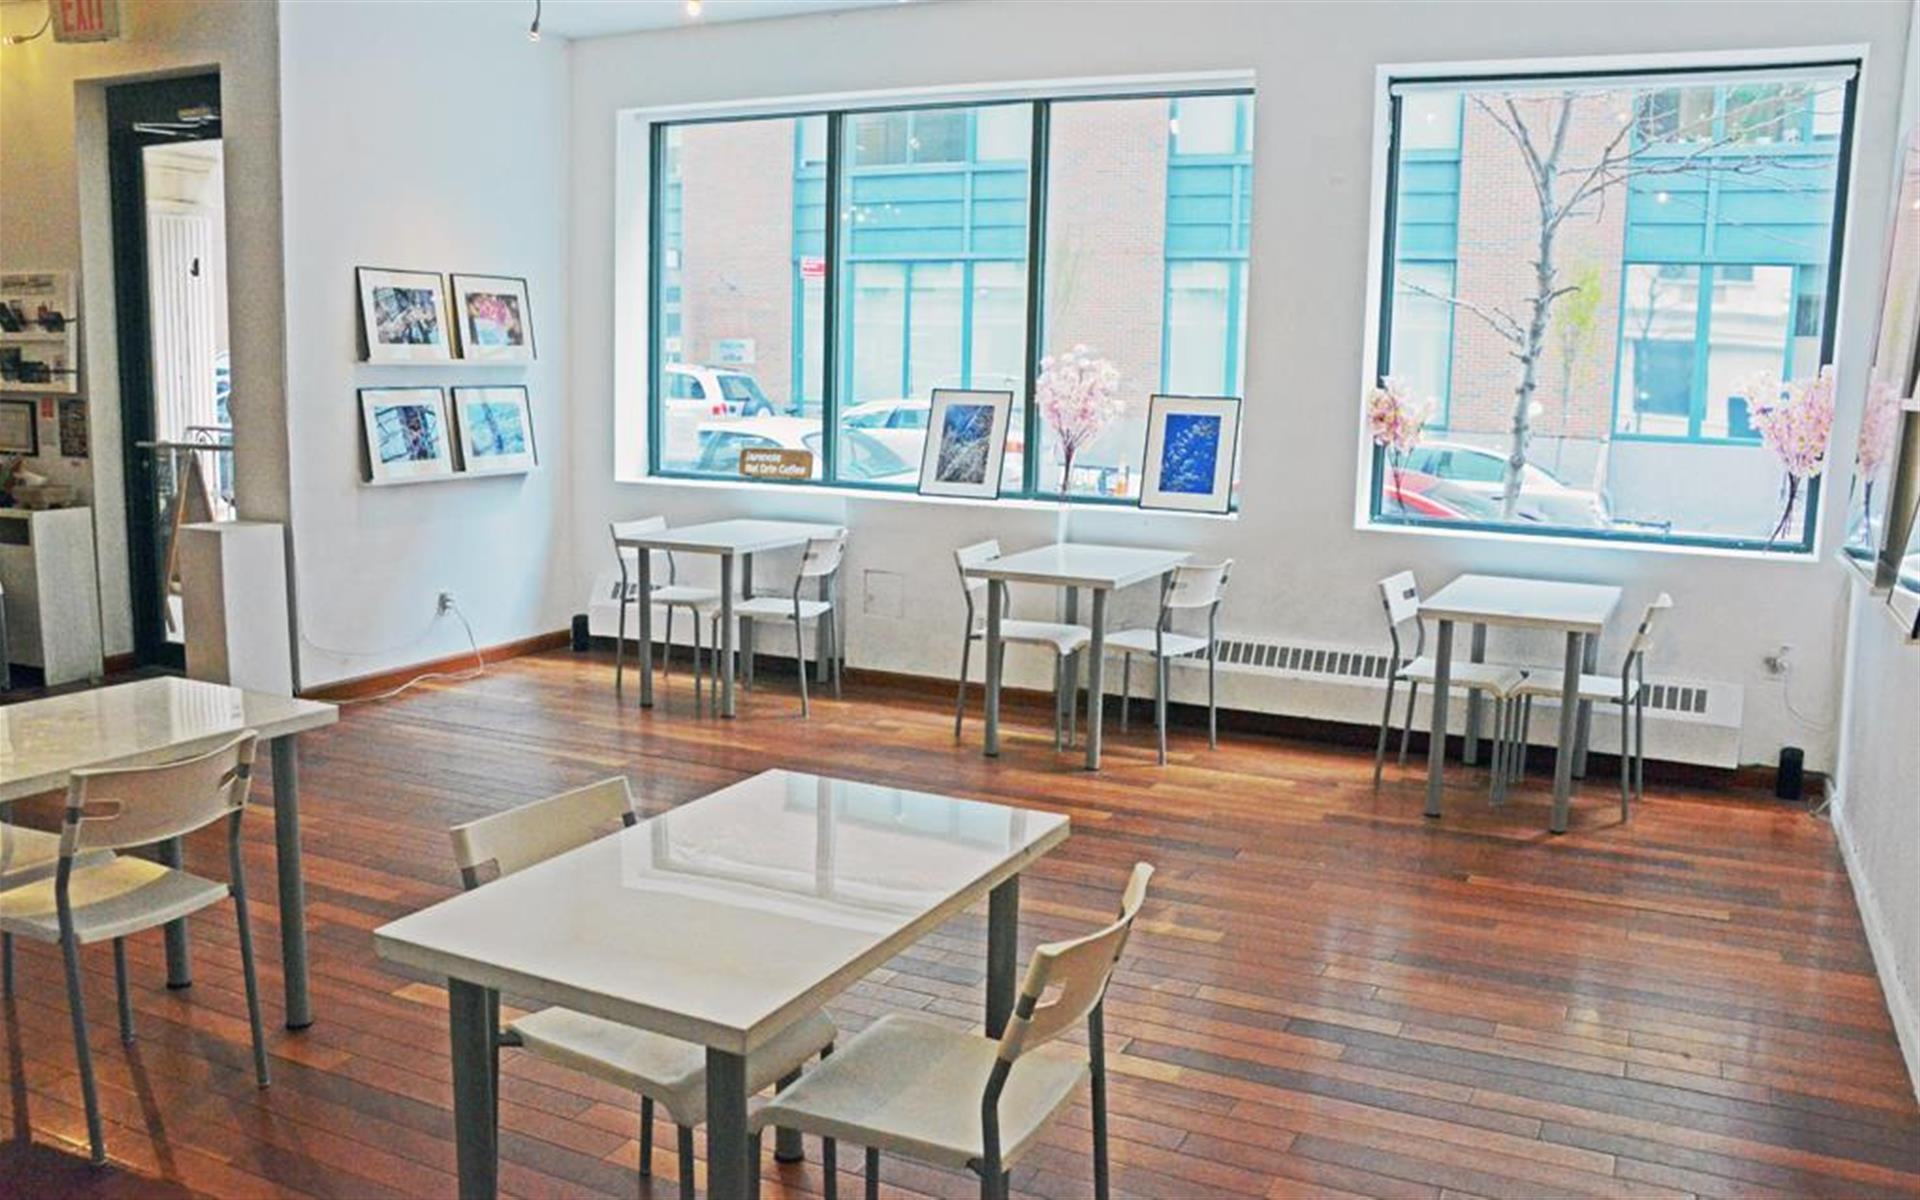 RESOBOX Gallery & Cafe - RESOBOX Gallery Space